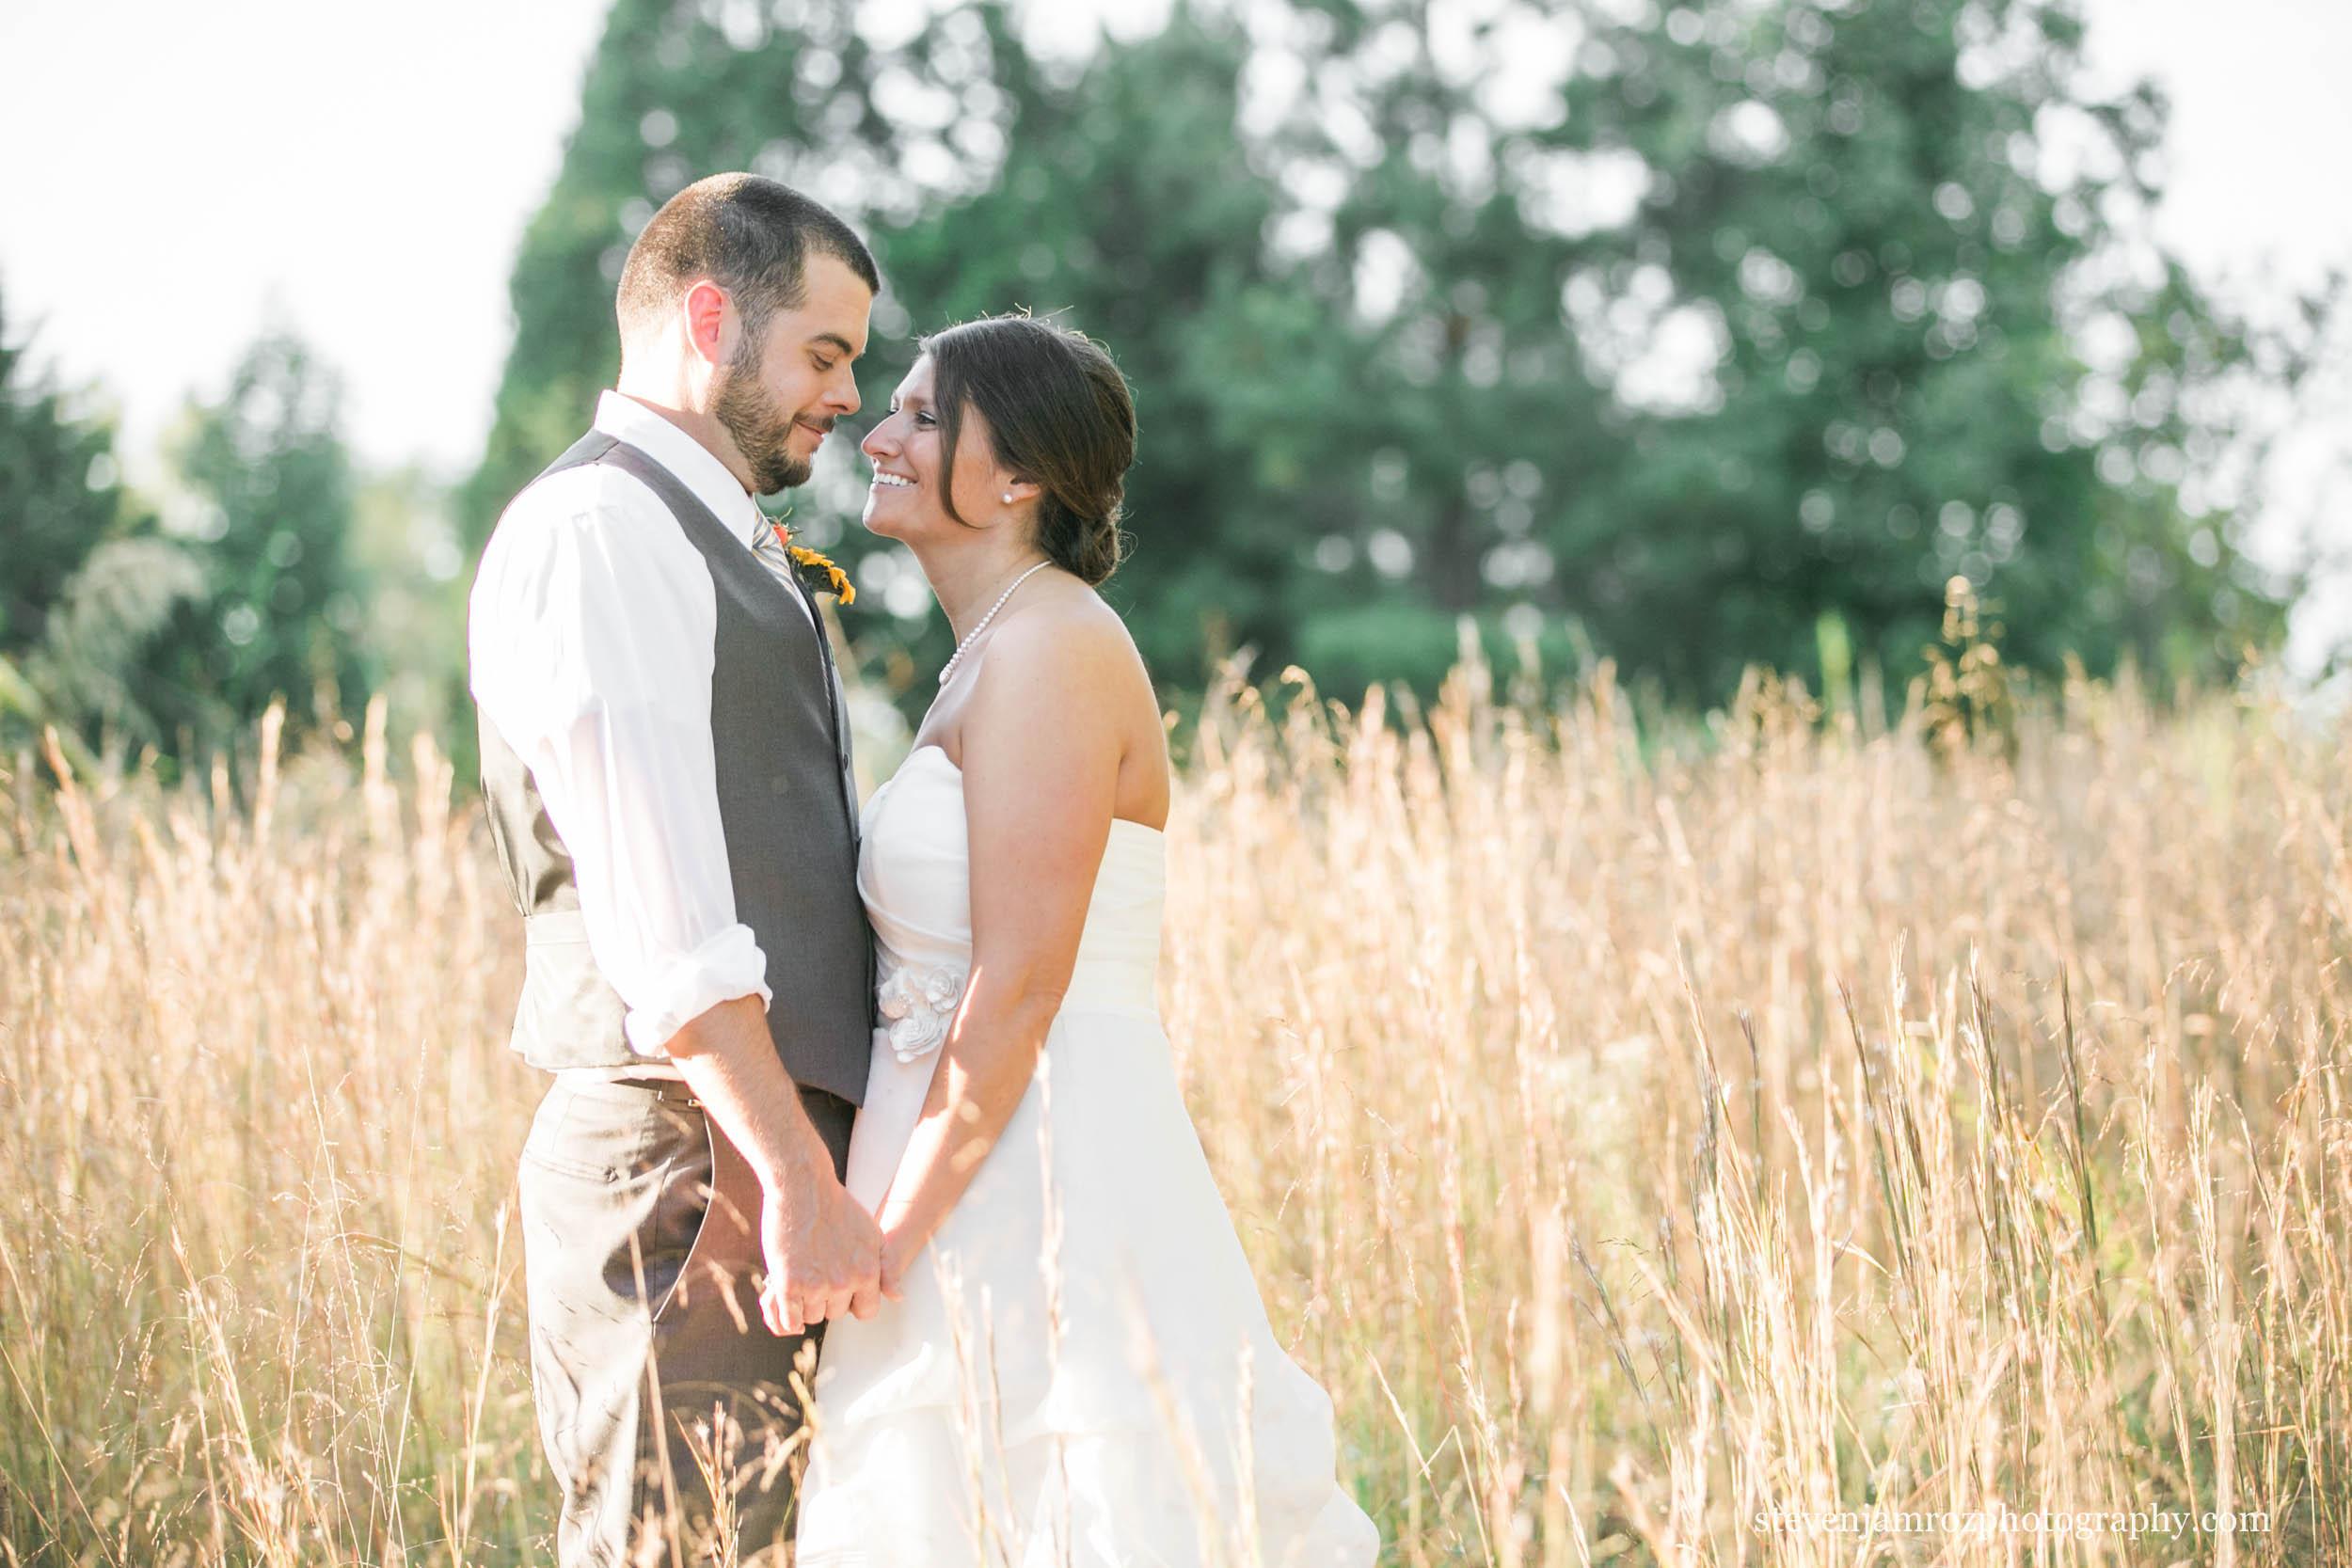 grass-field-bride-groom-snipes-farm-chapel-hill-steven-jamroz-photography-0108.jpg